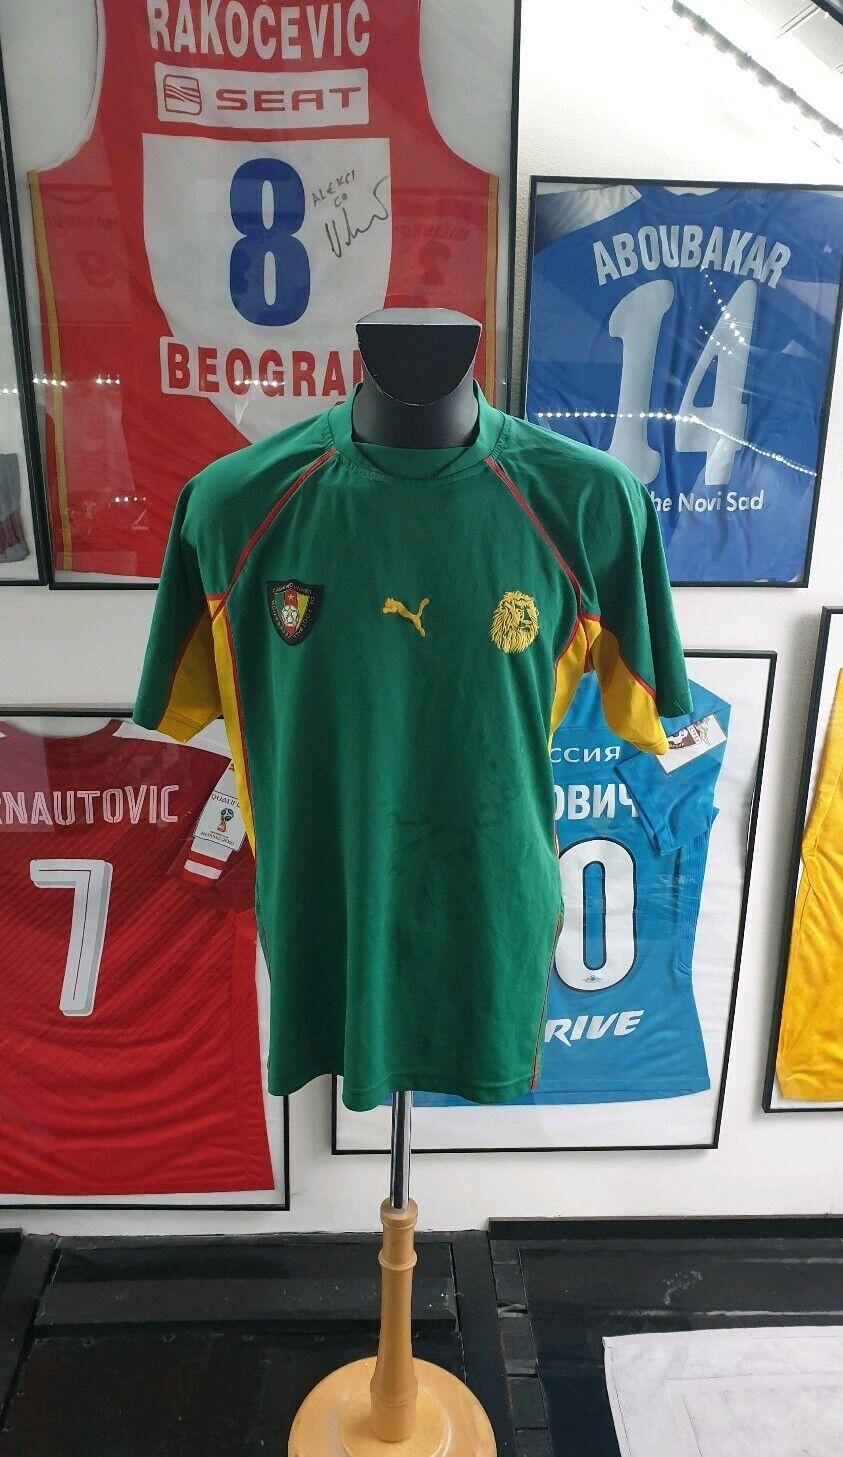 Maillot Trikot Camisa Camiseta  Cameroon Camerún Eto o 1998 1999 2000 99  genuina alta calidad